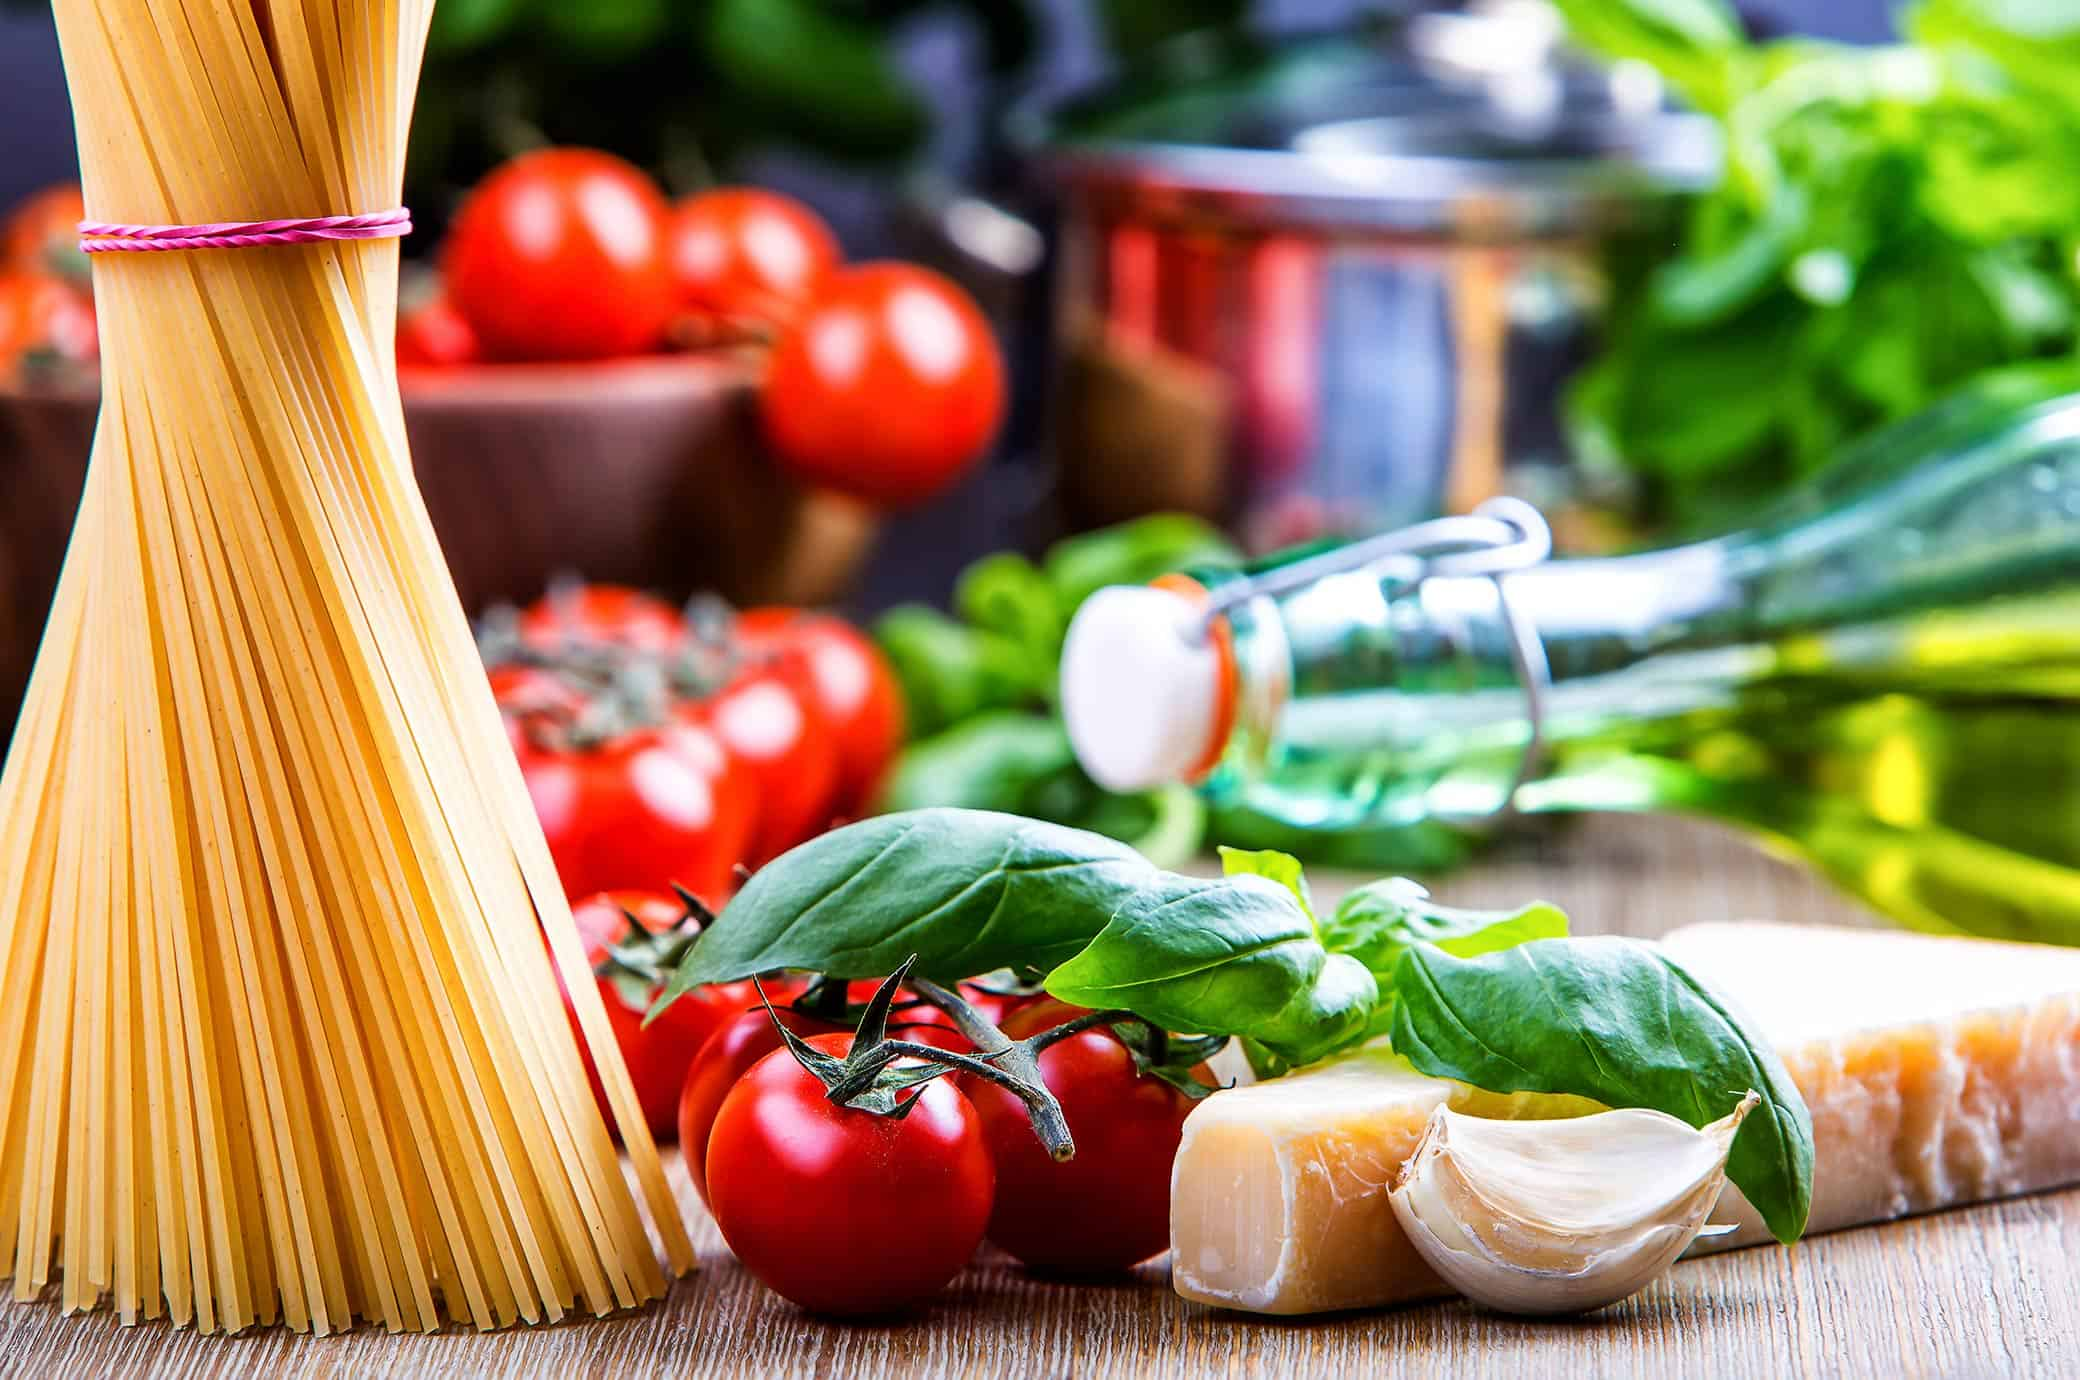 Italian week festival Italian week festival 6 2